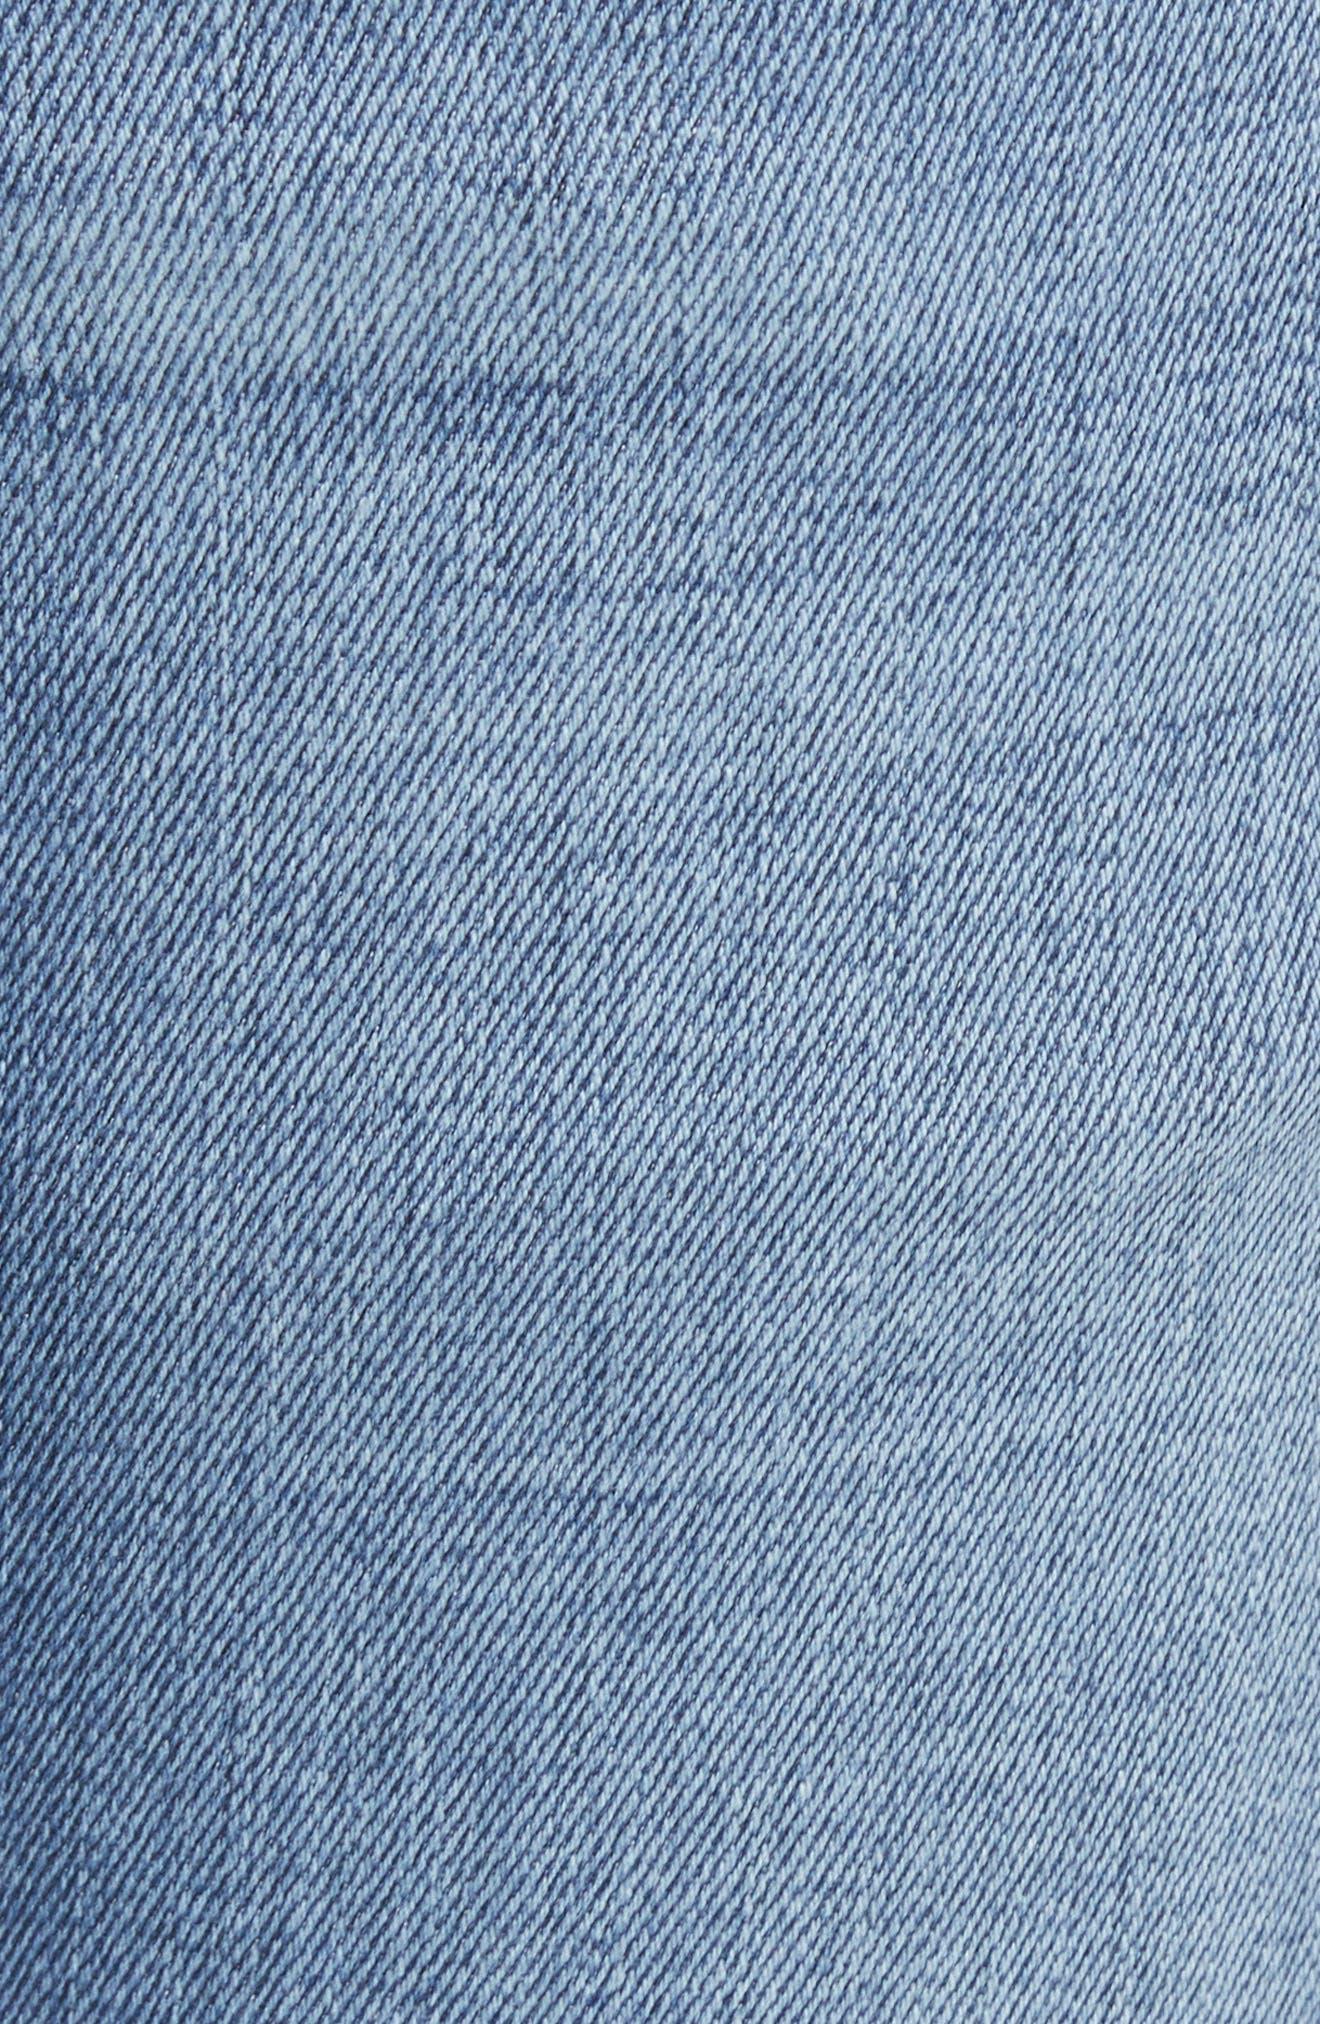 Torino Slim Fit Jeans,                             Alternate thumbnail 5, color,                             Elysium Blue